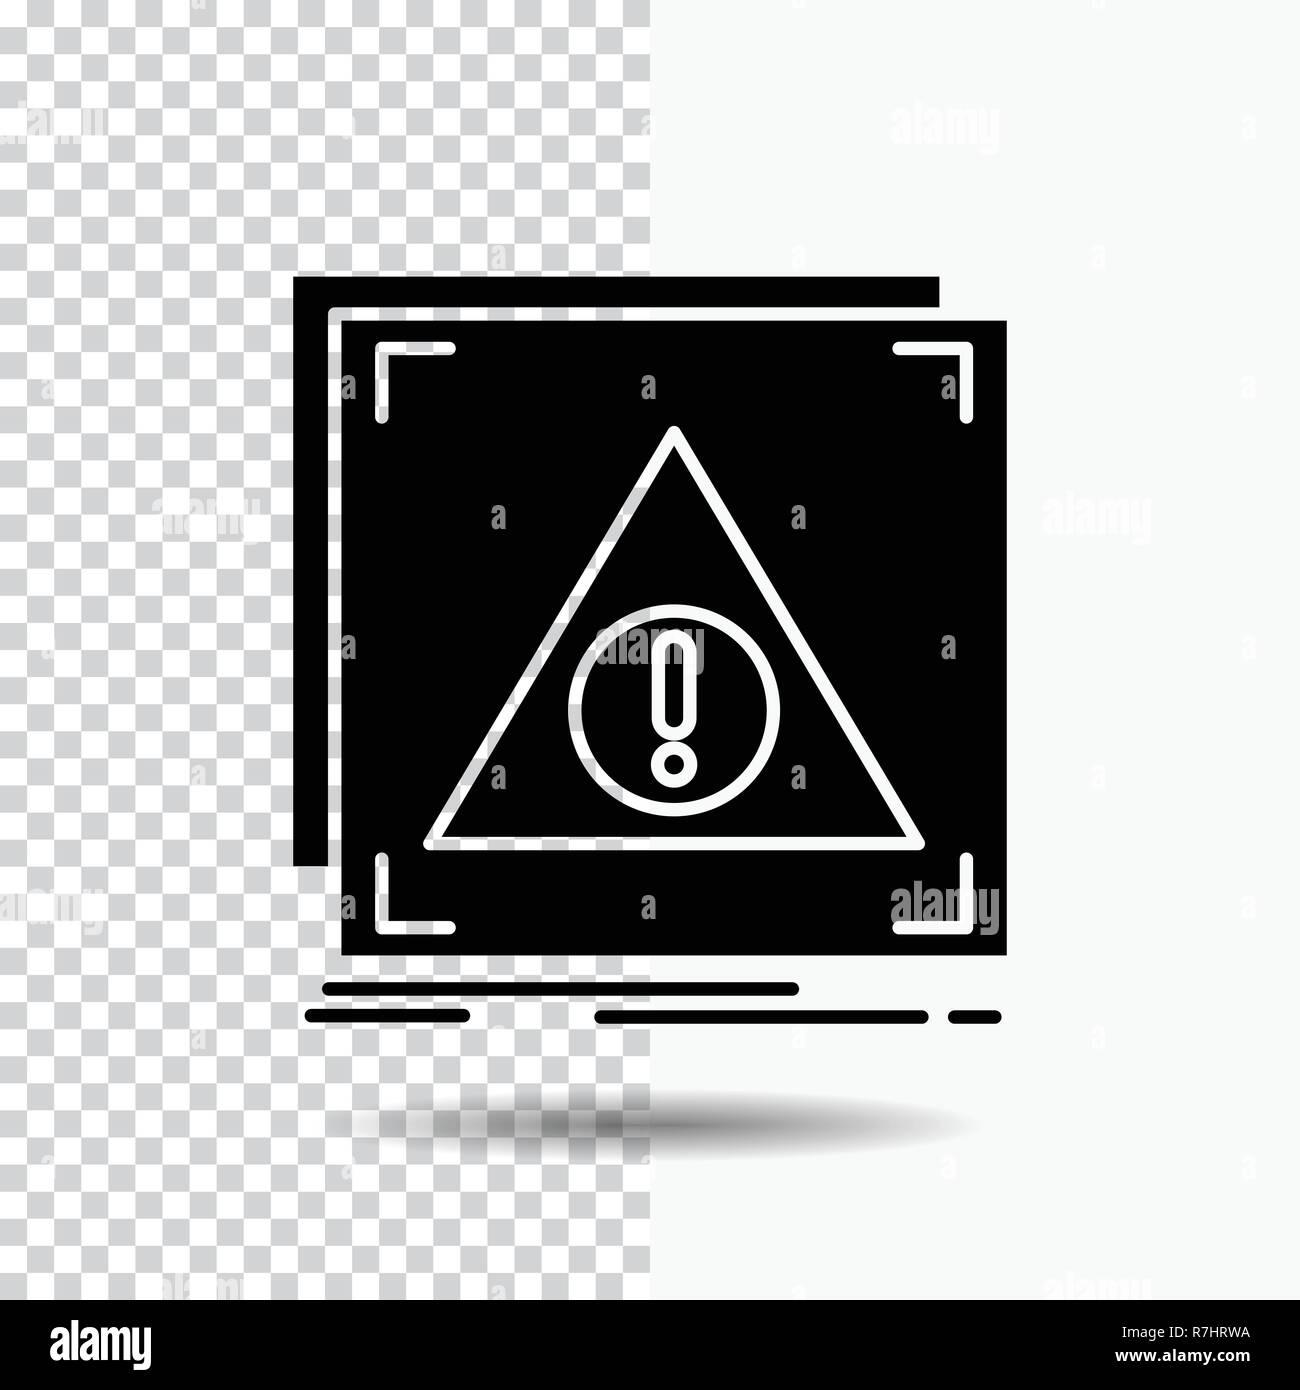 Error, Application, Denied, server, alert Glyph Icon on Transparent Background. Black Icon - Stock Image